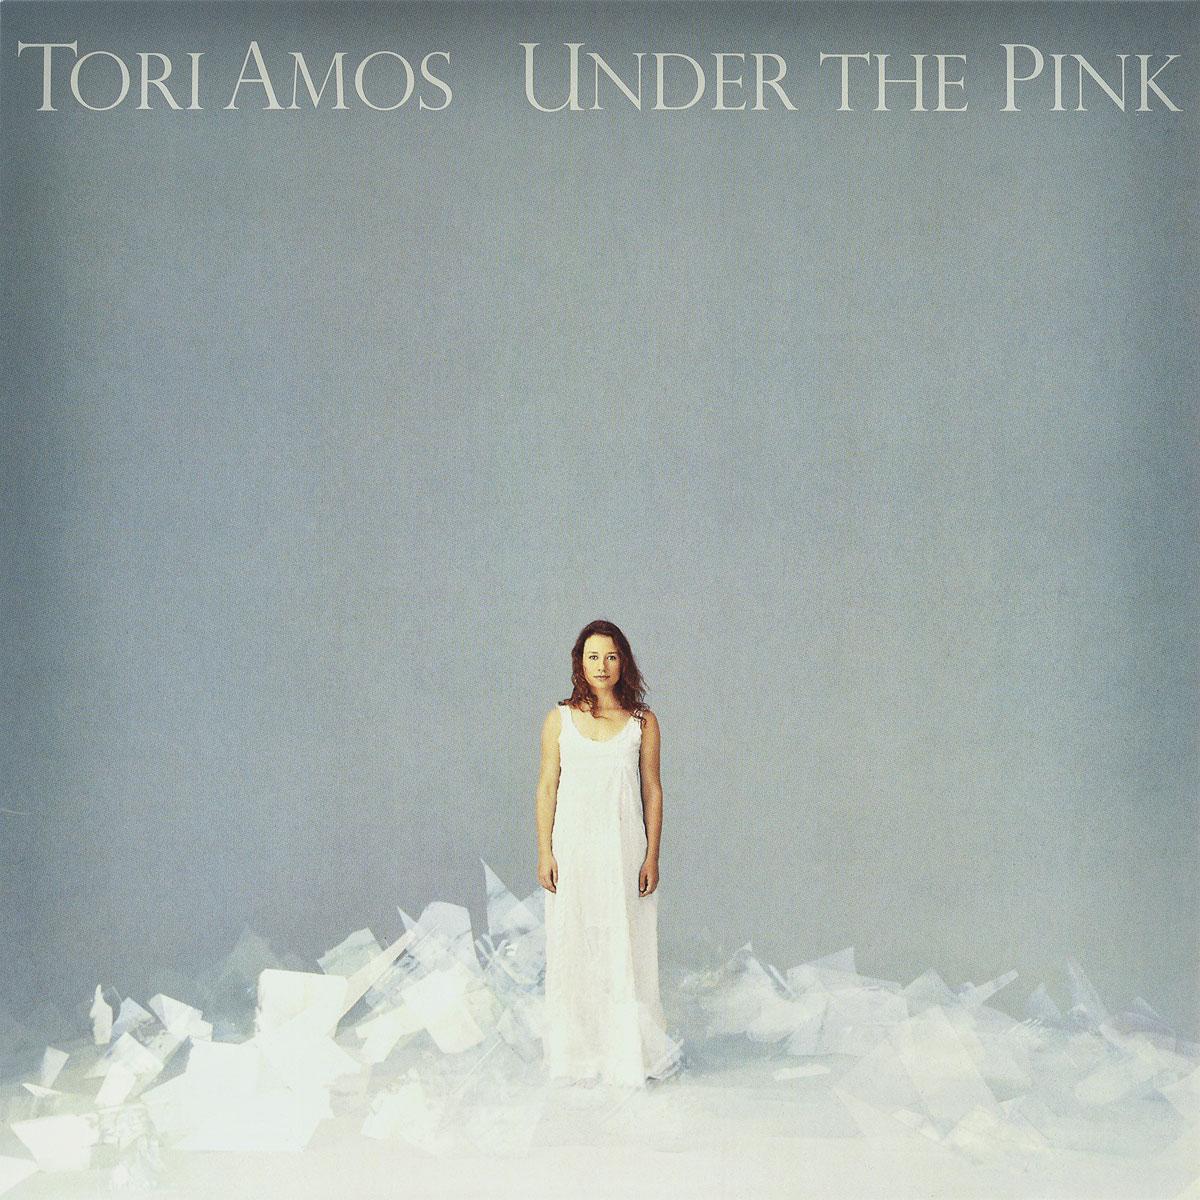 цена на Тори Эмос Tori Amos. Under The Pink (LP)